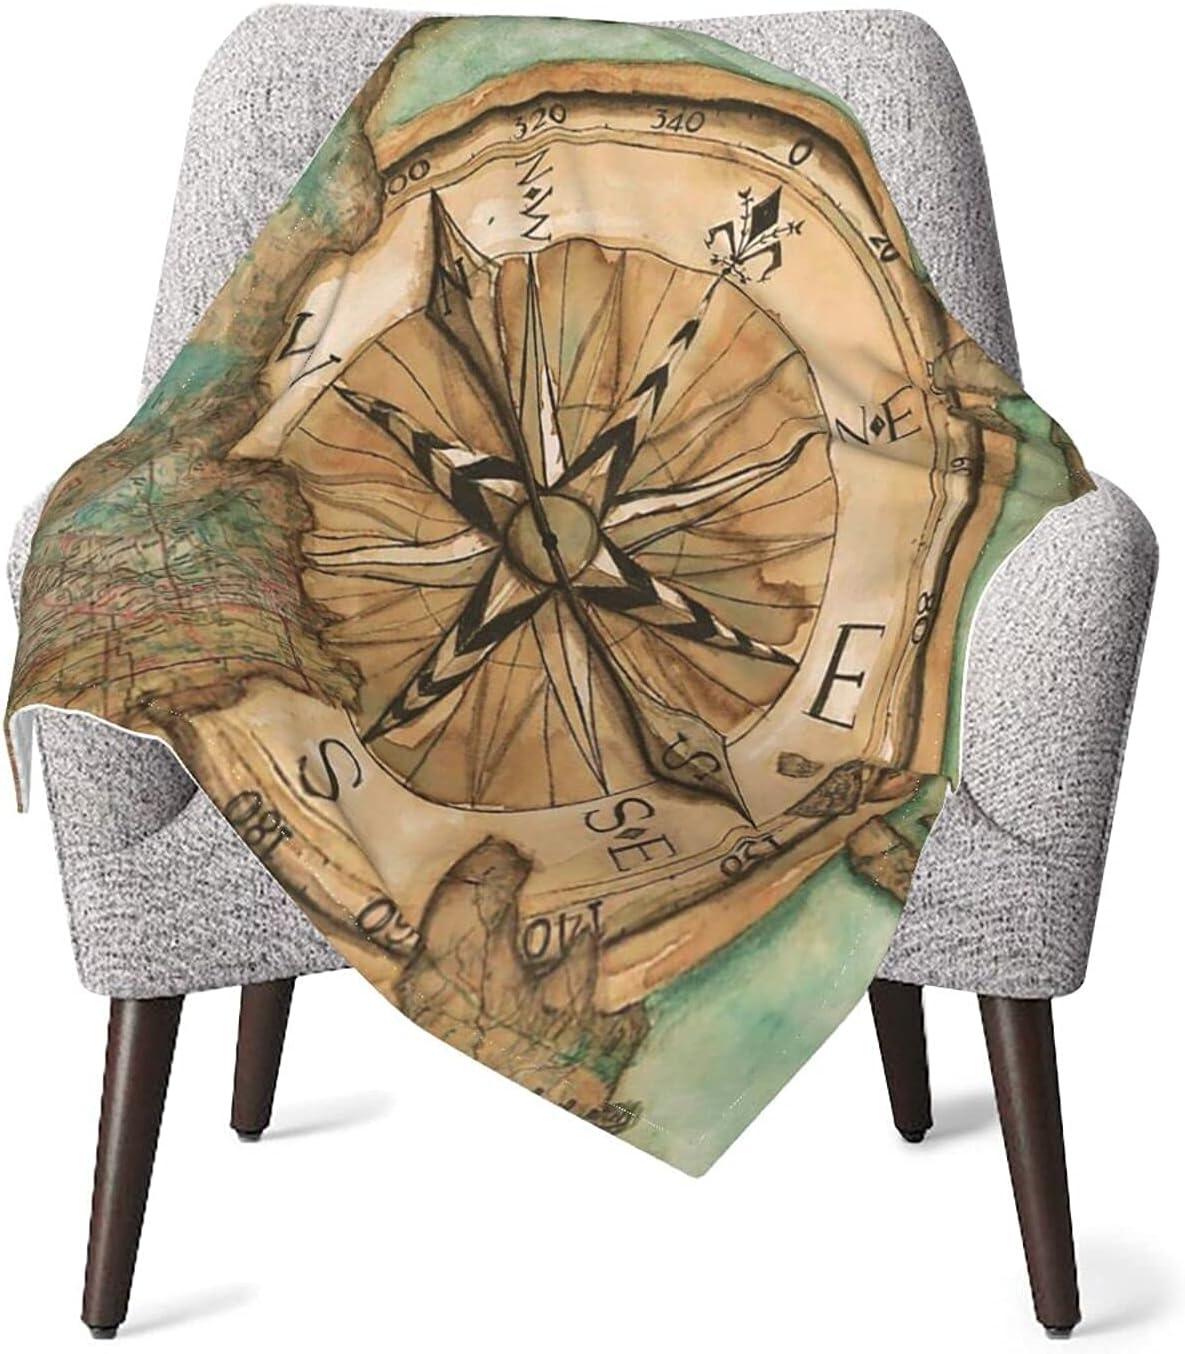 Nautical Compass Wooden Warm Cozy Virginia Beach Mall Air Conditionin Many popular brands Throw Blankets